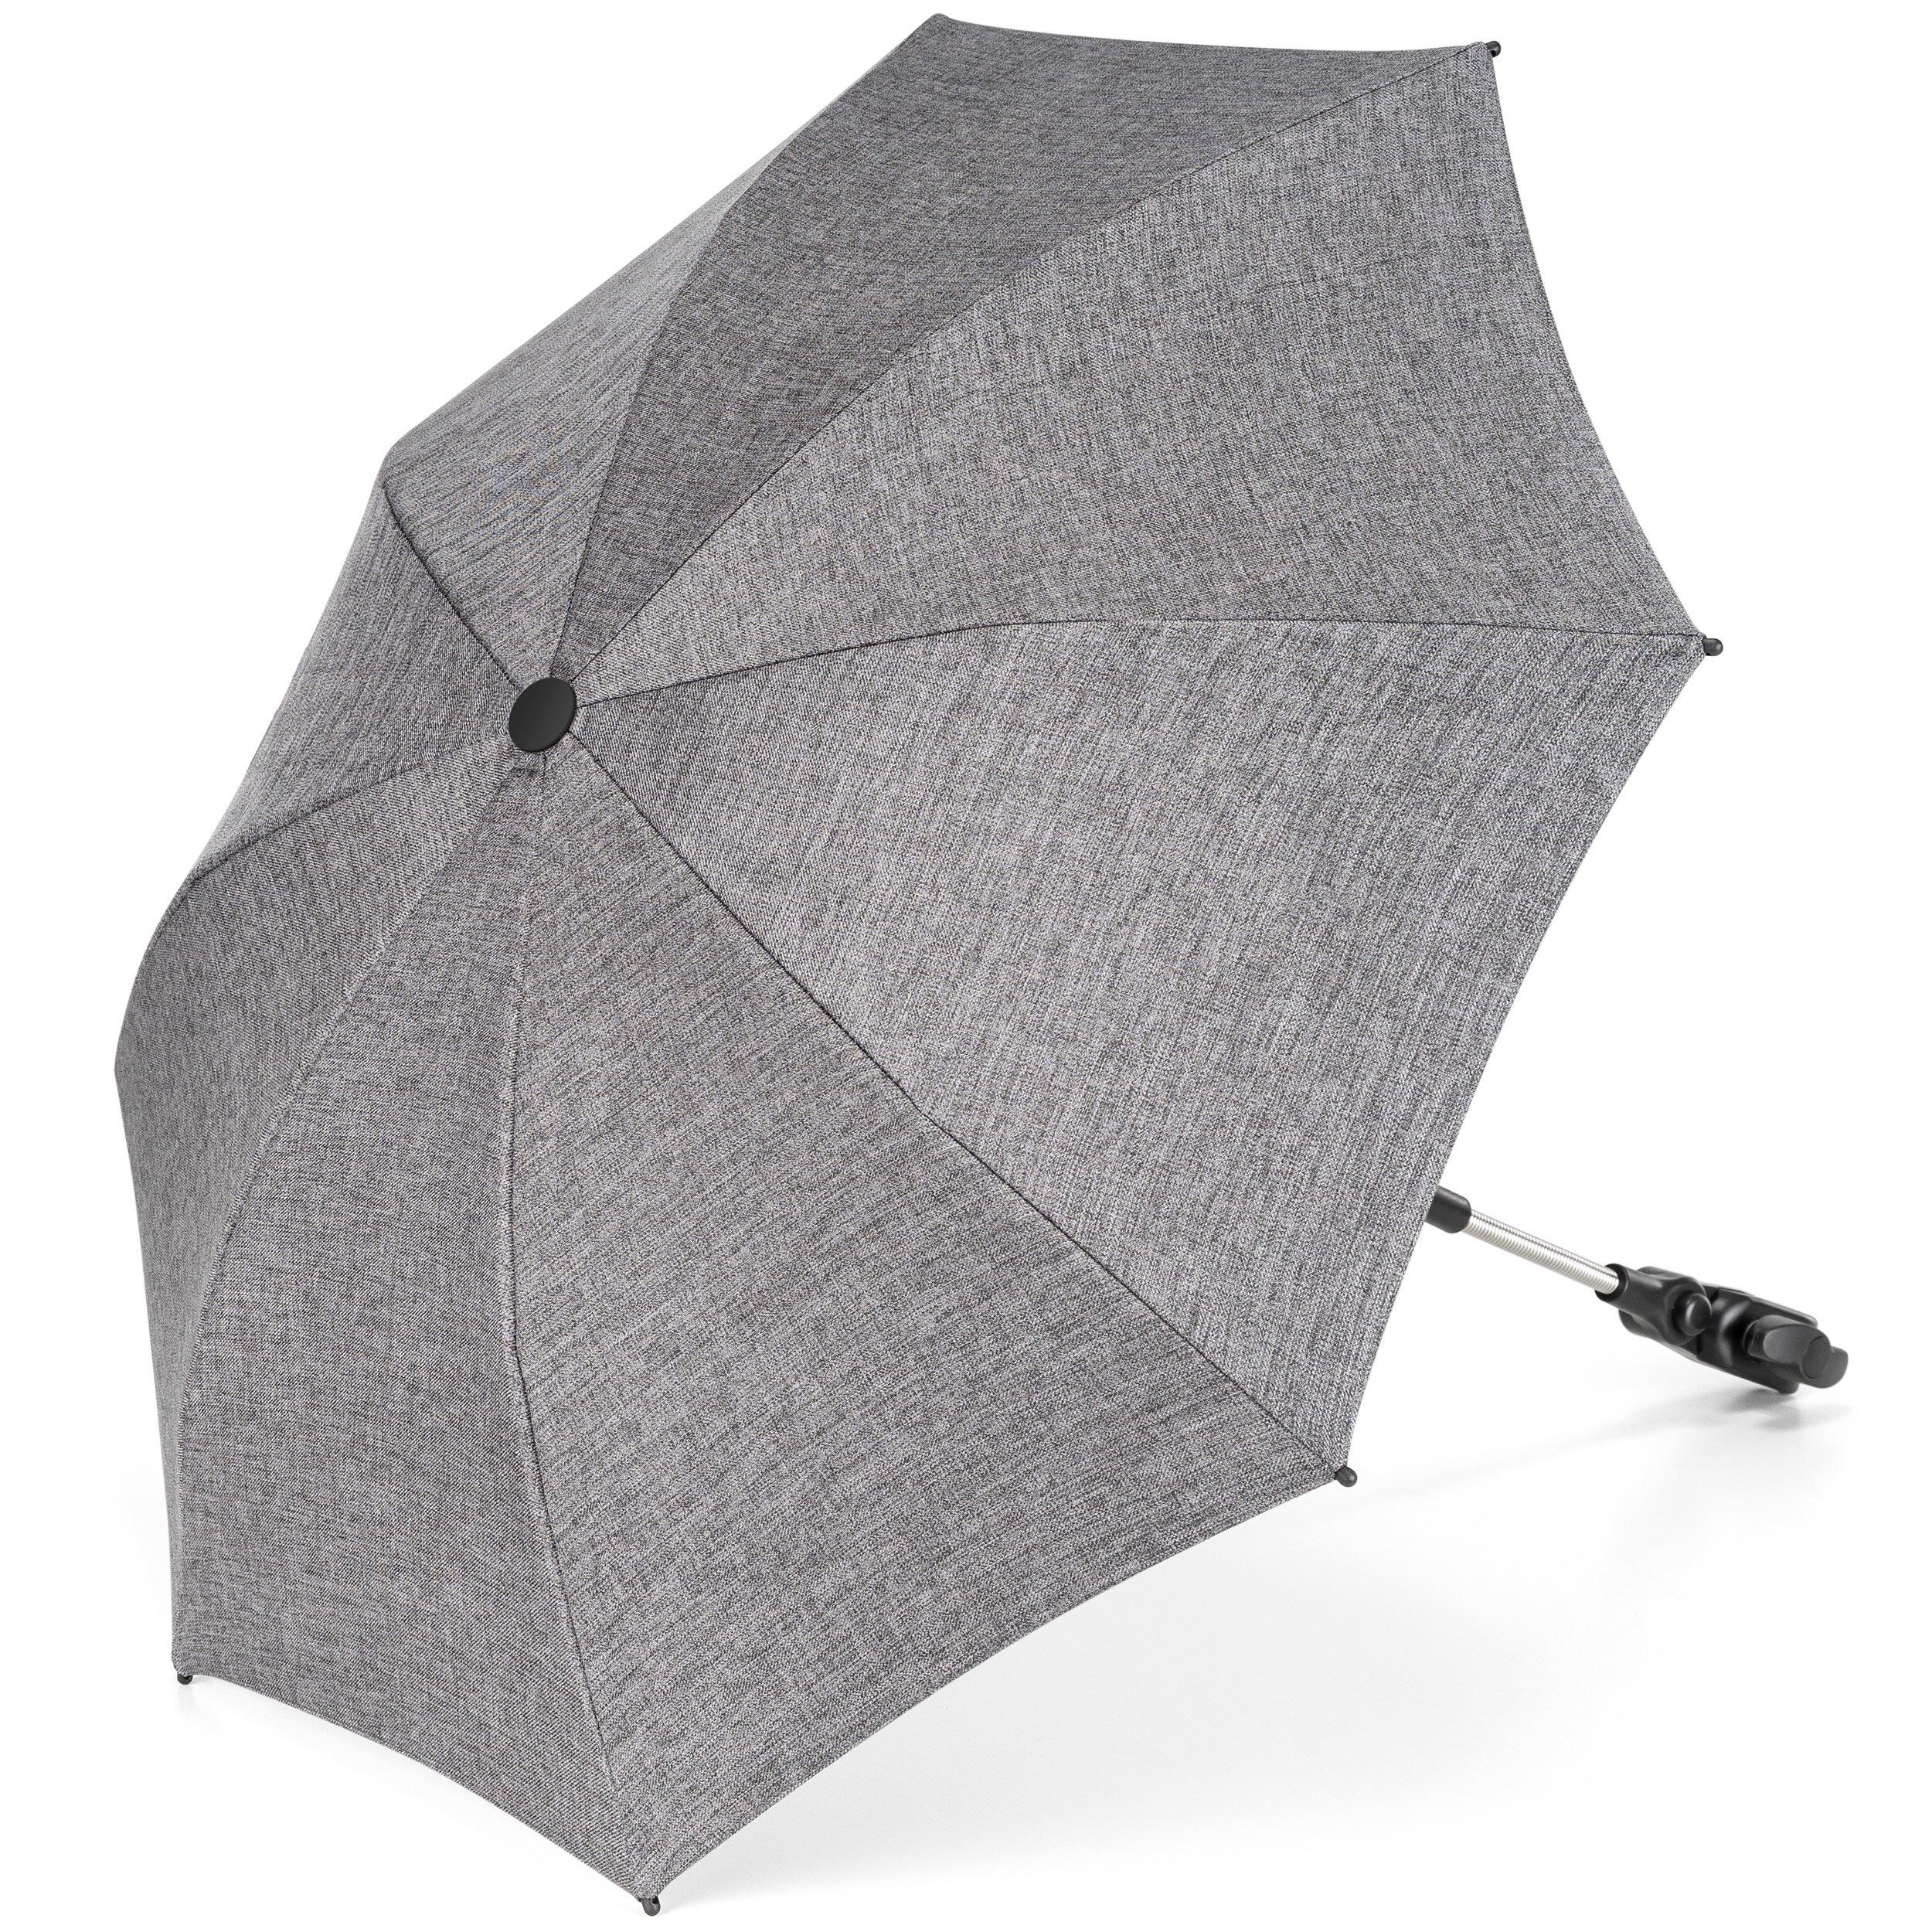 Red New Universal Pushchair Baby Pram Parasol Sun Protection UV Rays Umbrella Shade